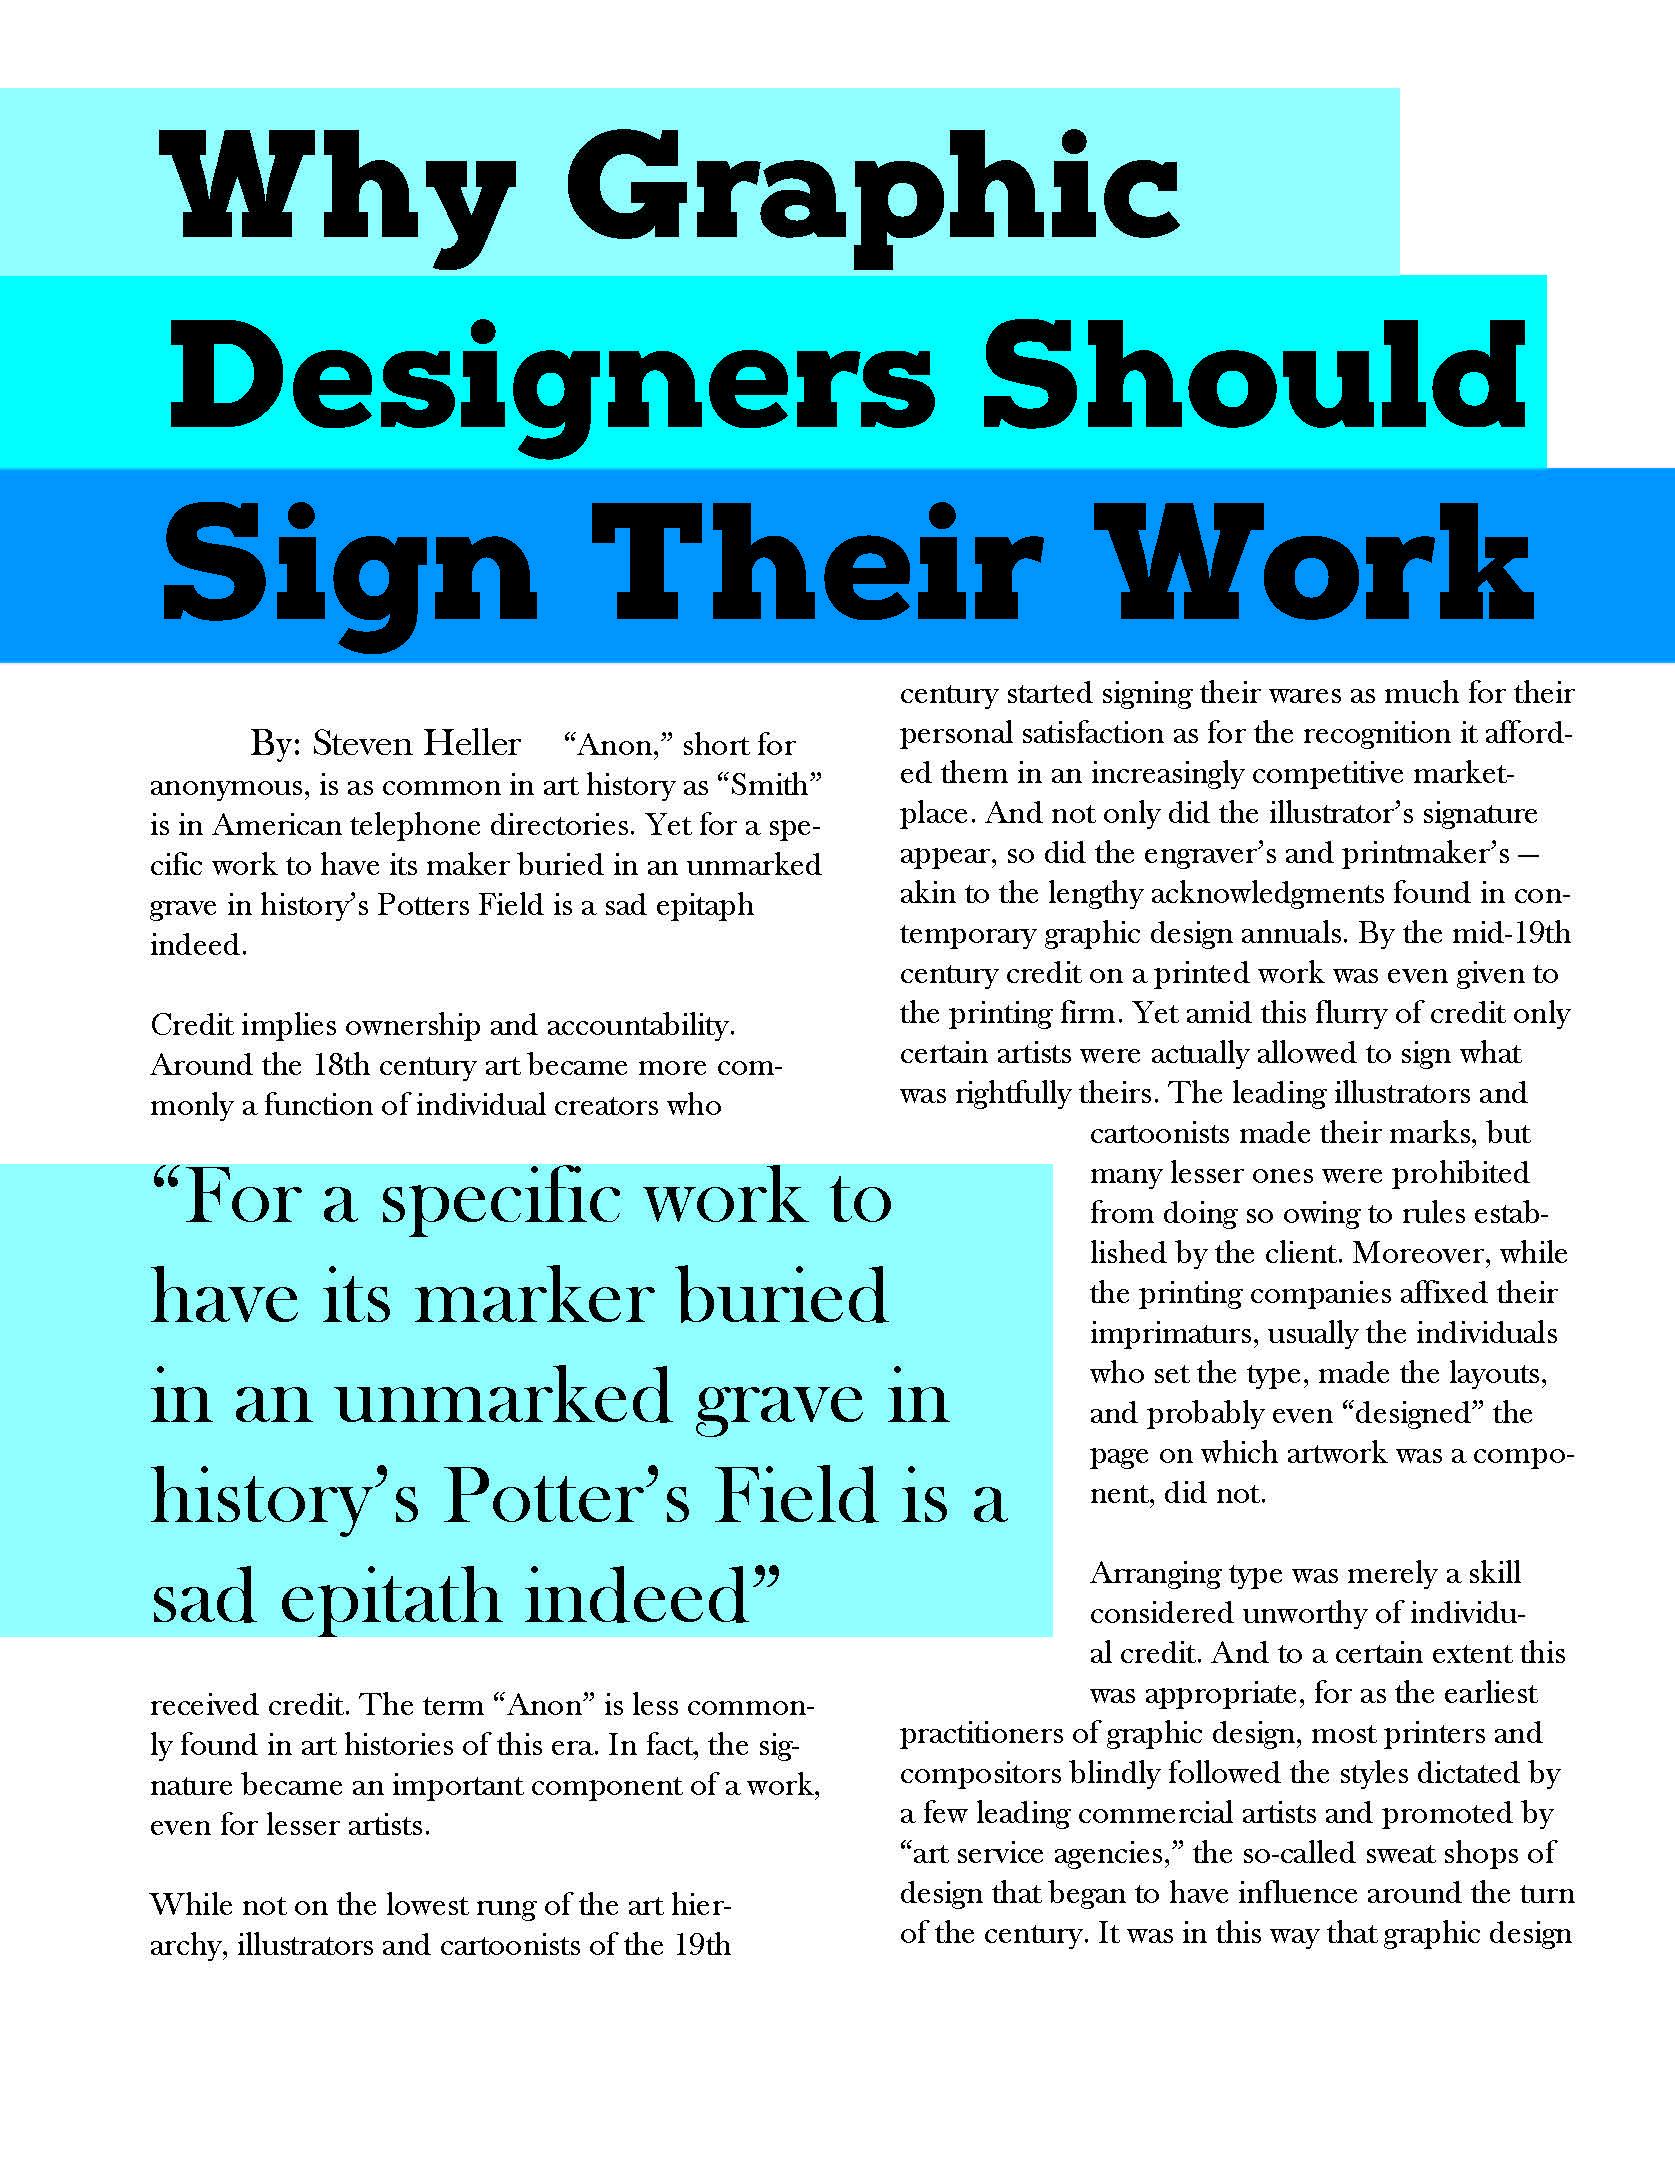 Grieshop-MagazineCopy_Page_1.jpg